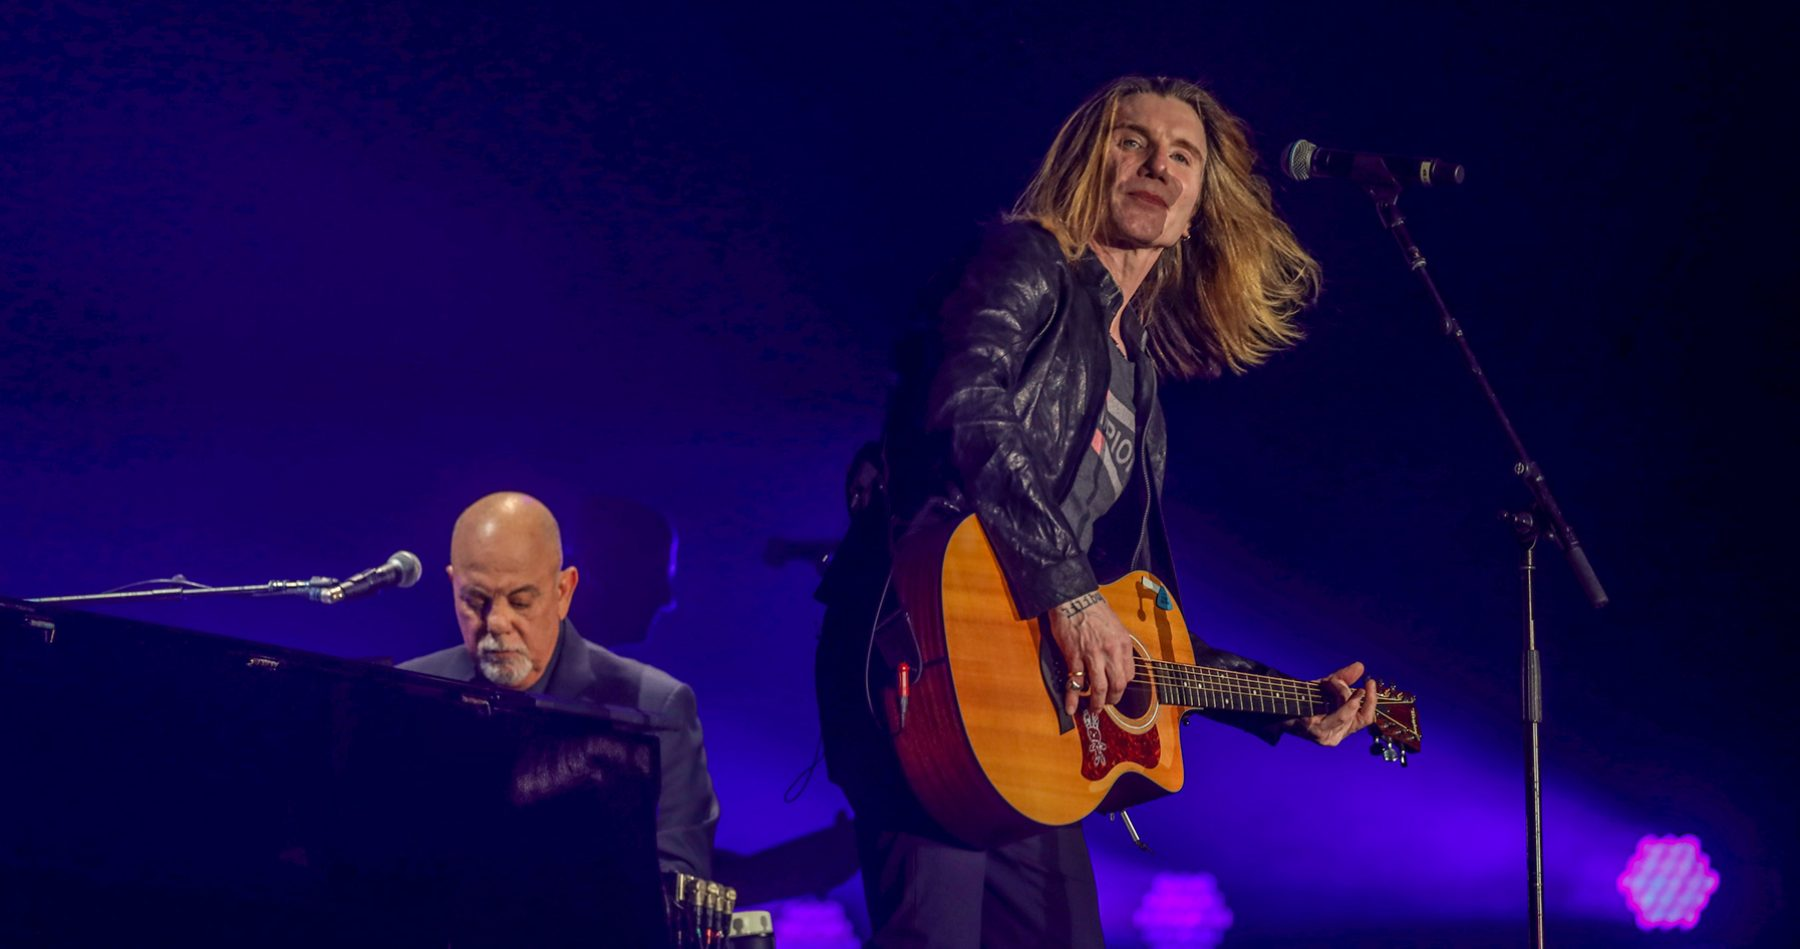 Billy Joel and John Rzeznik of the Goo Goo Dolls at Billy's concert at Highmark Stadium in Buffalo, NY, August 14, 2021